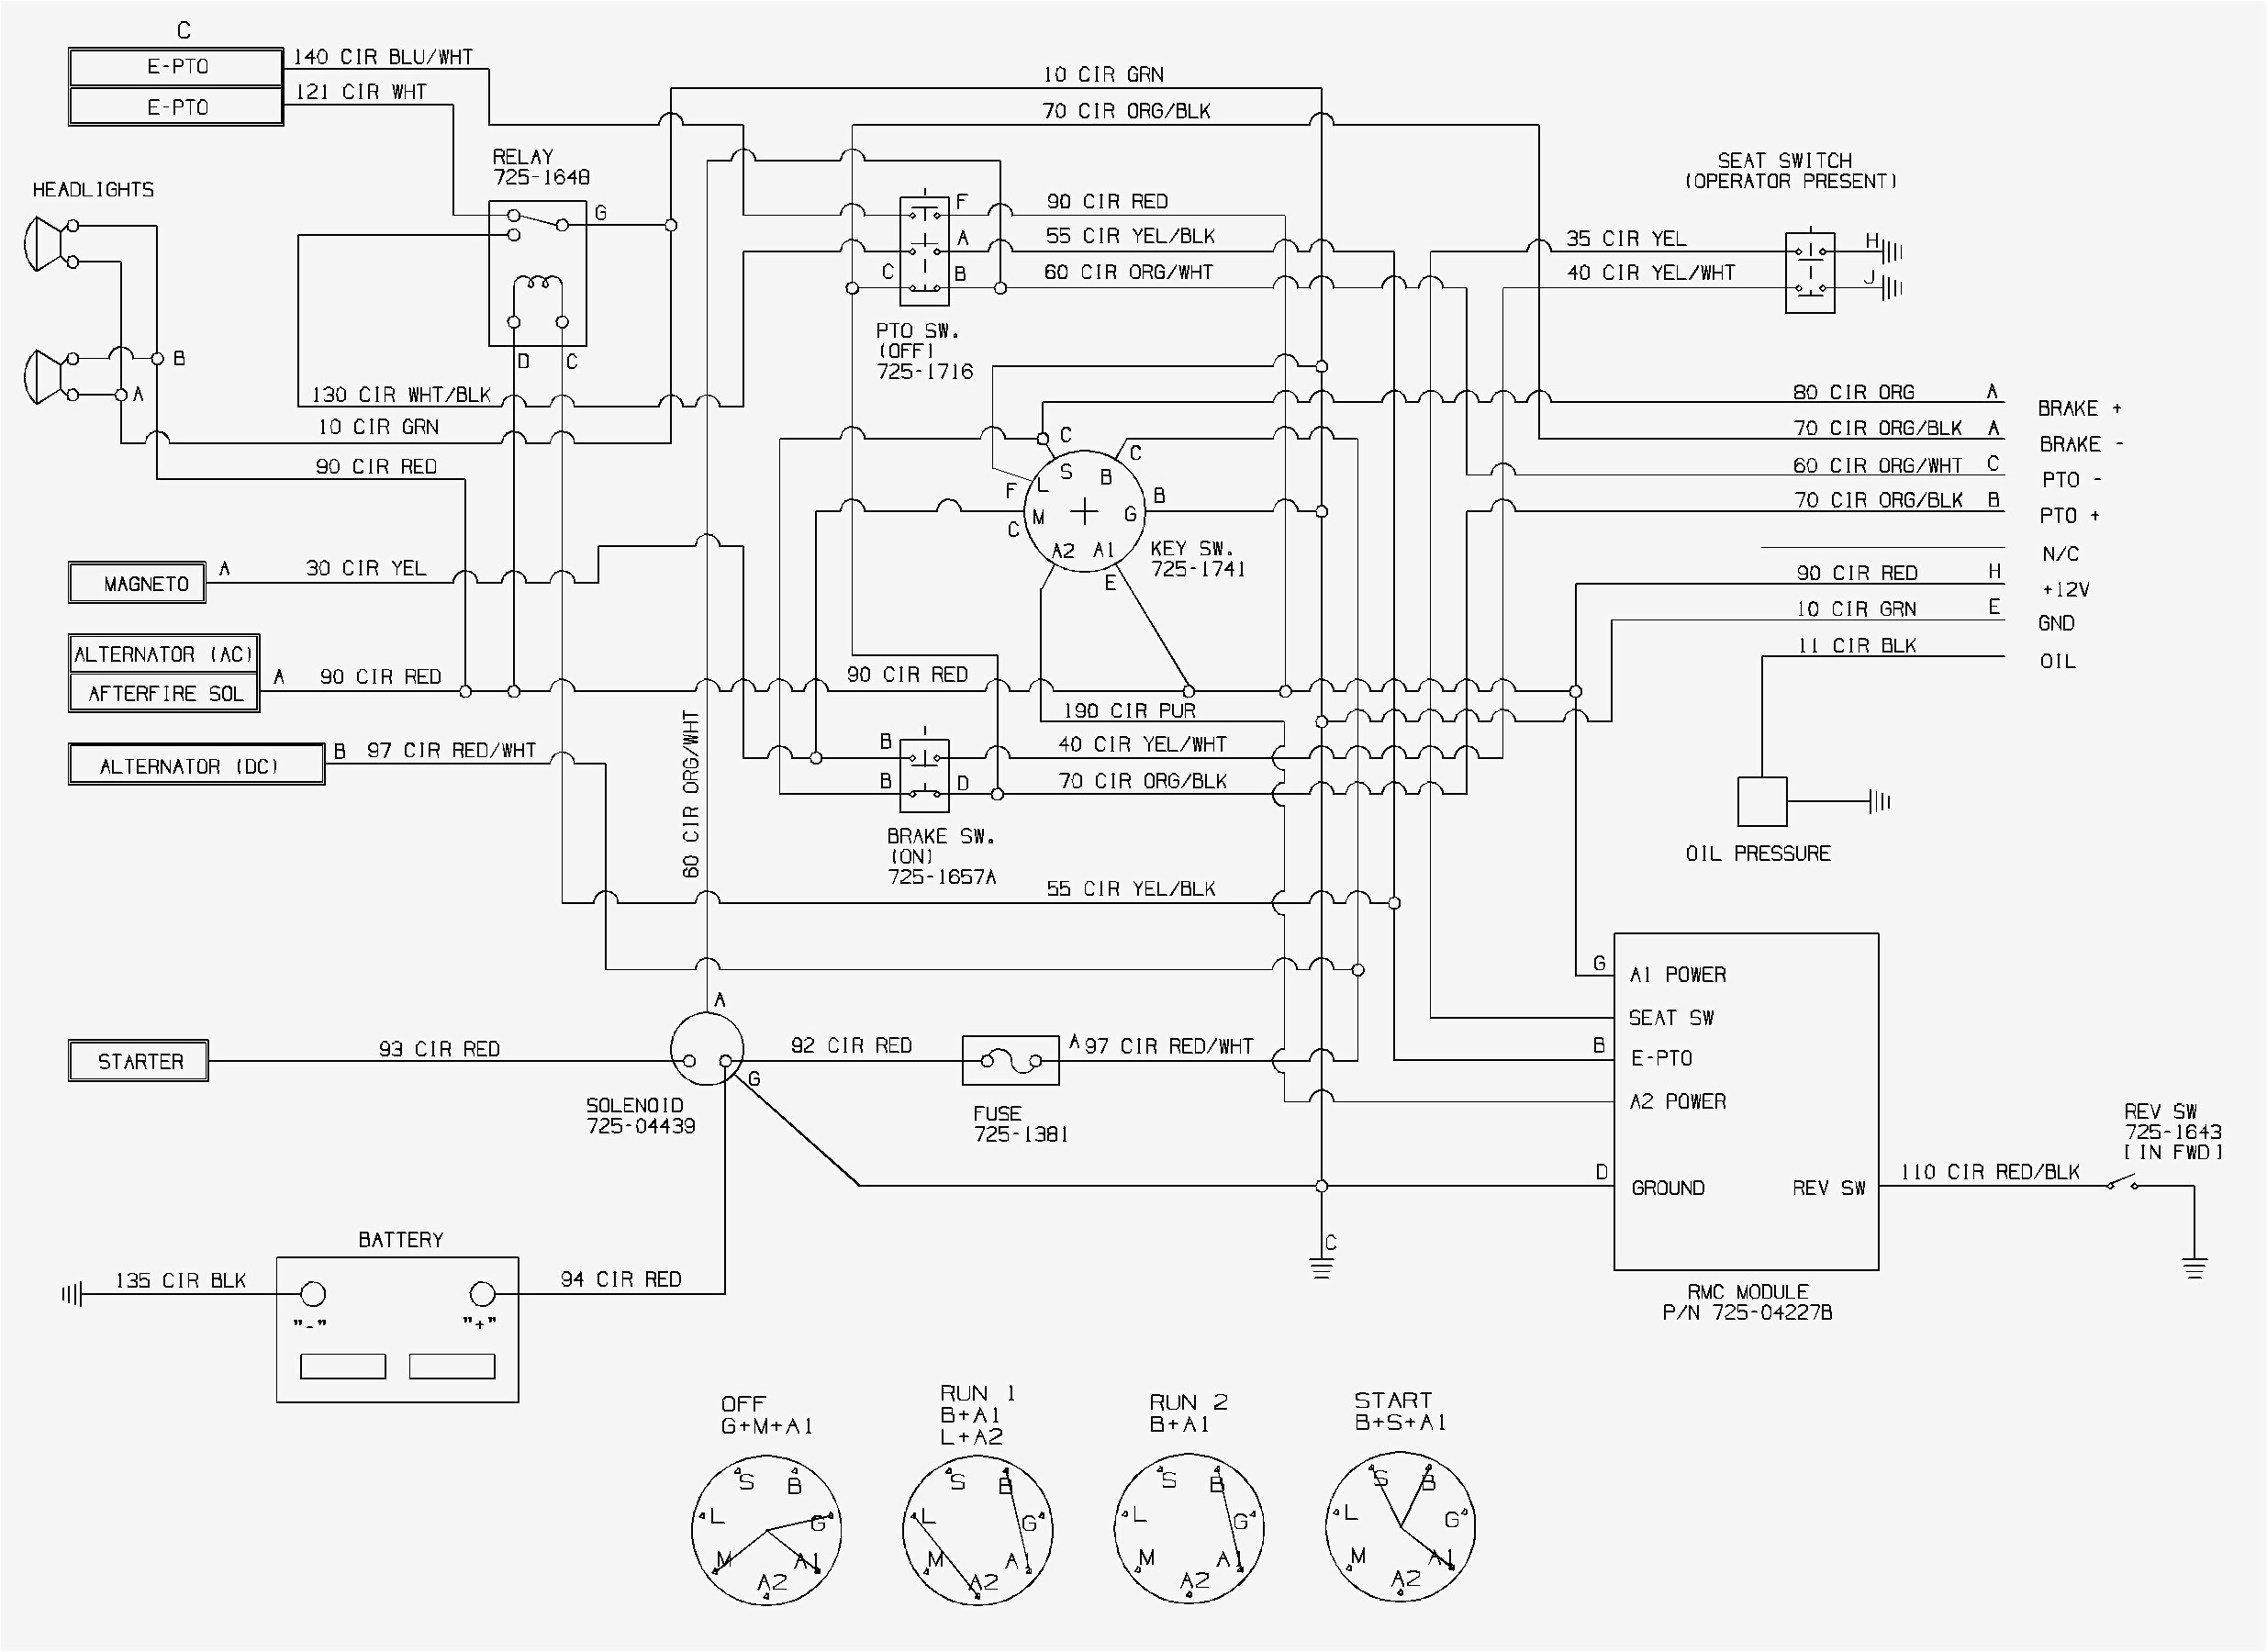 cub cadet 1250 wiring diagram wiring diagram fascinatingwiring diagram for cub cadet 125 wiring diagrams favorites